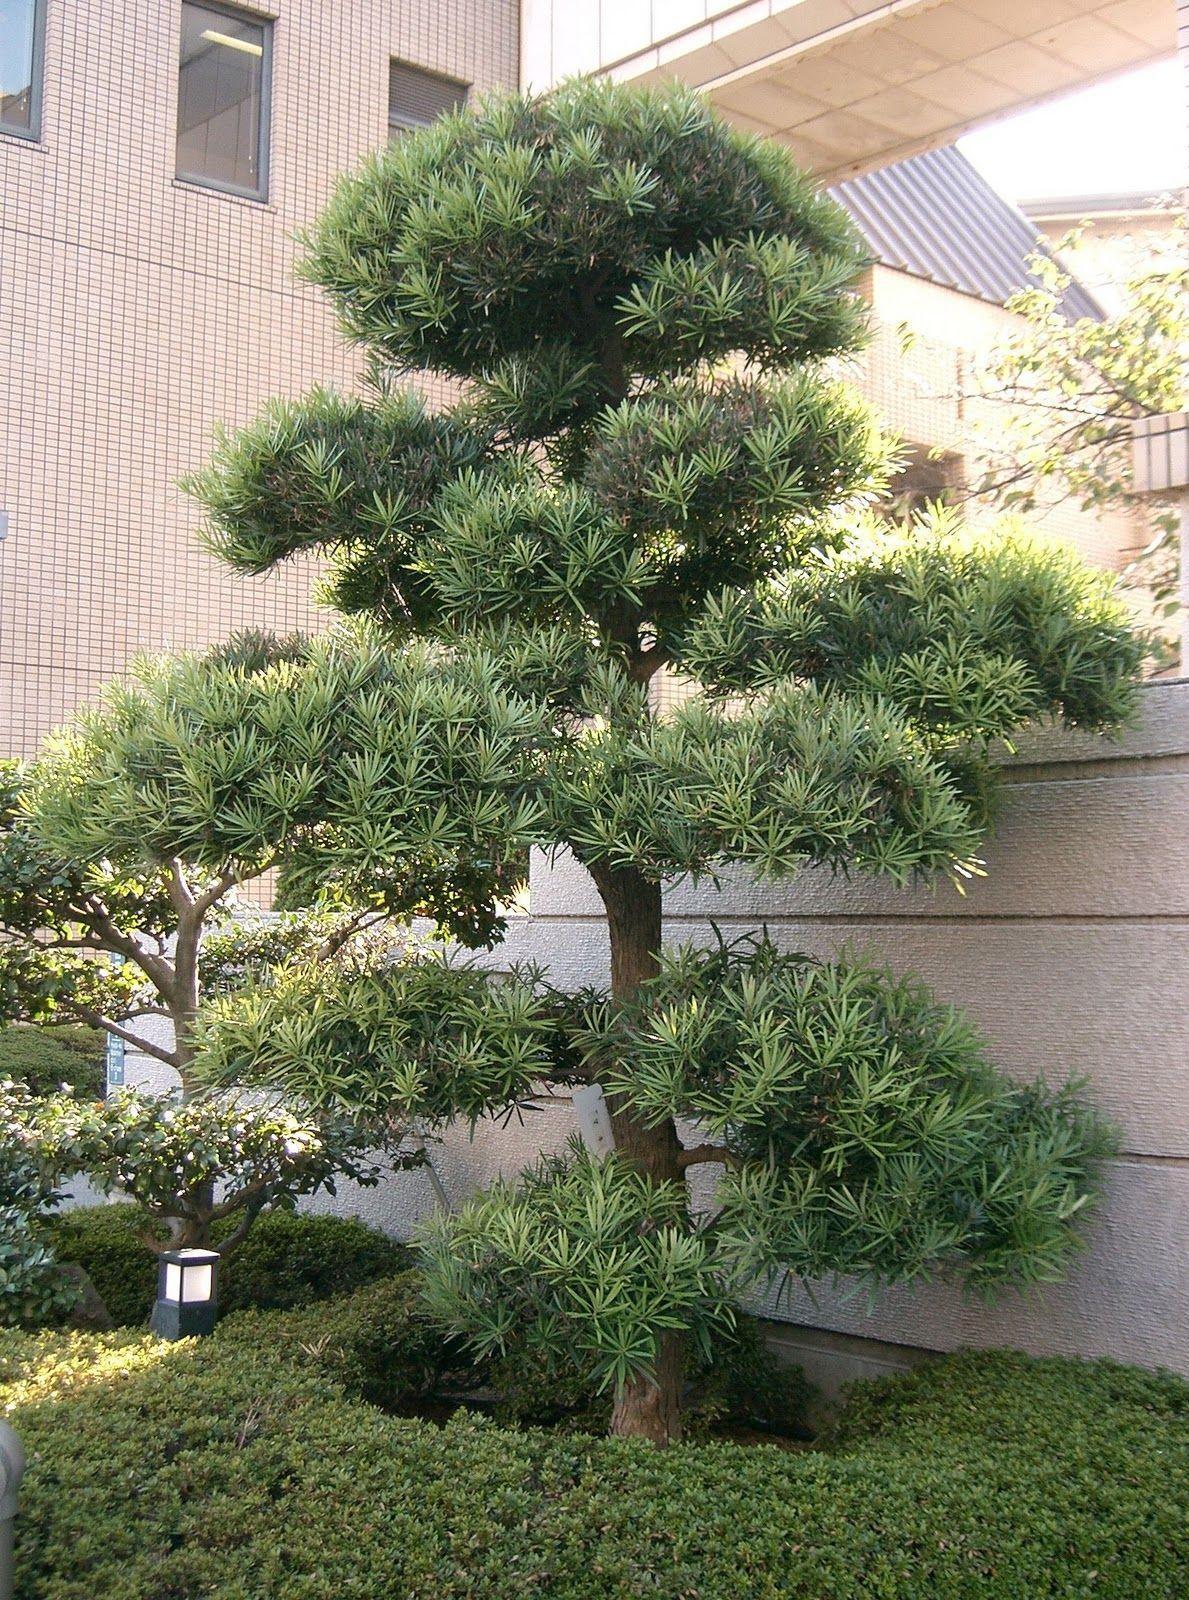 Shrub id podocarpus macrophyllus yew pine garden for Small garden trees for sale